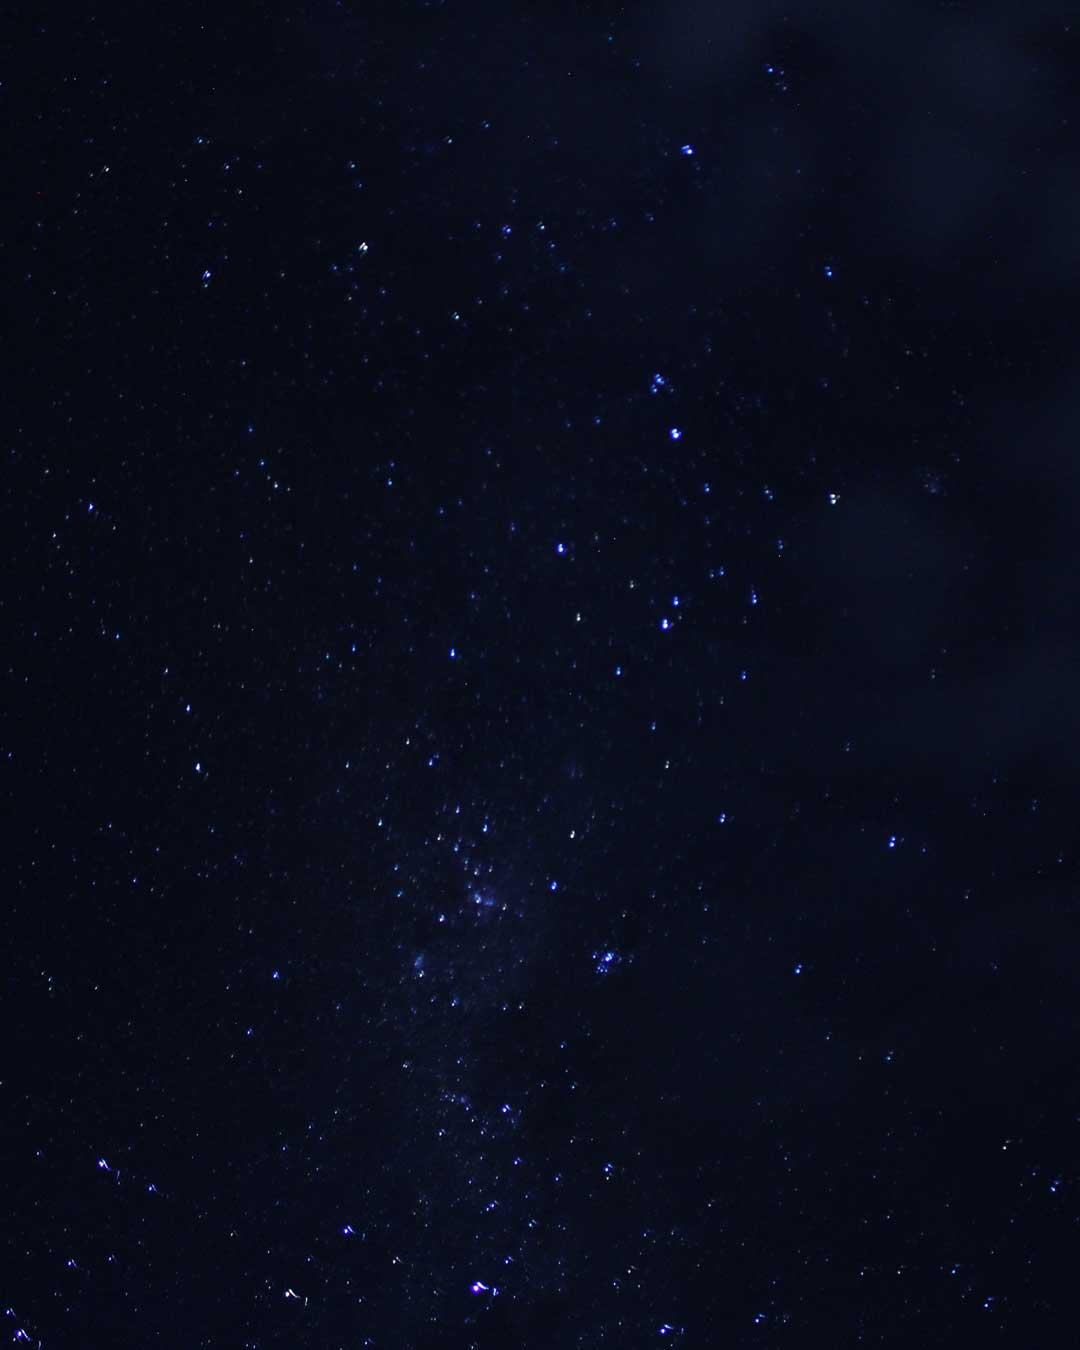 Night Sky at Coles Bay Tasmania